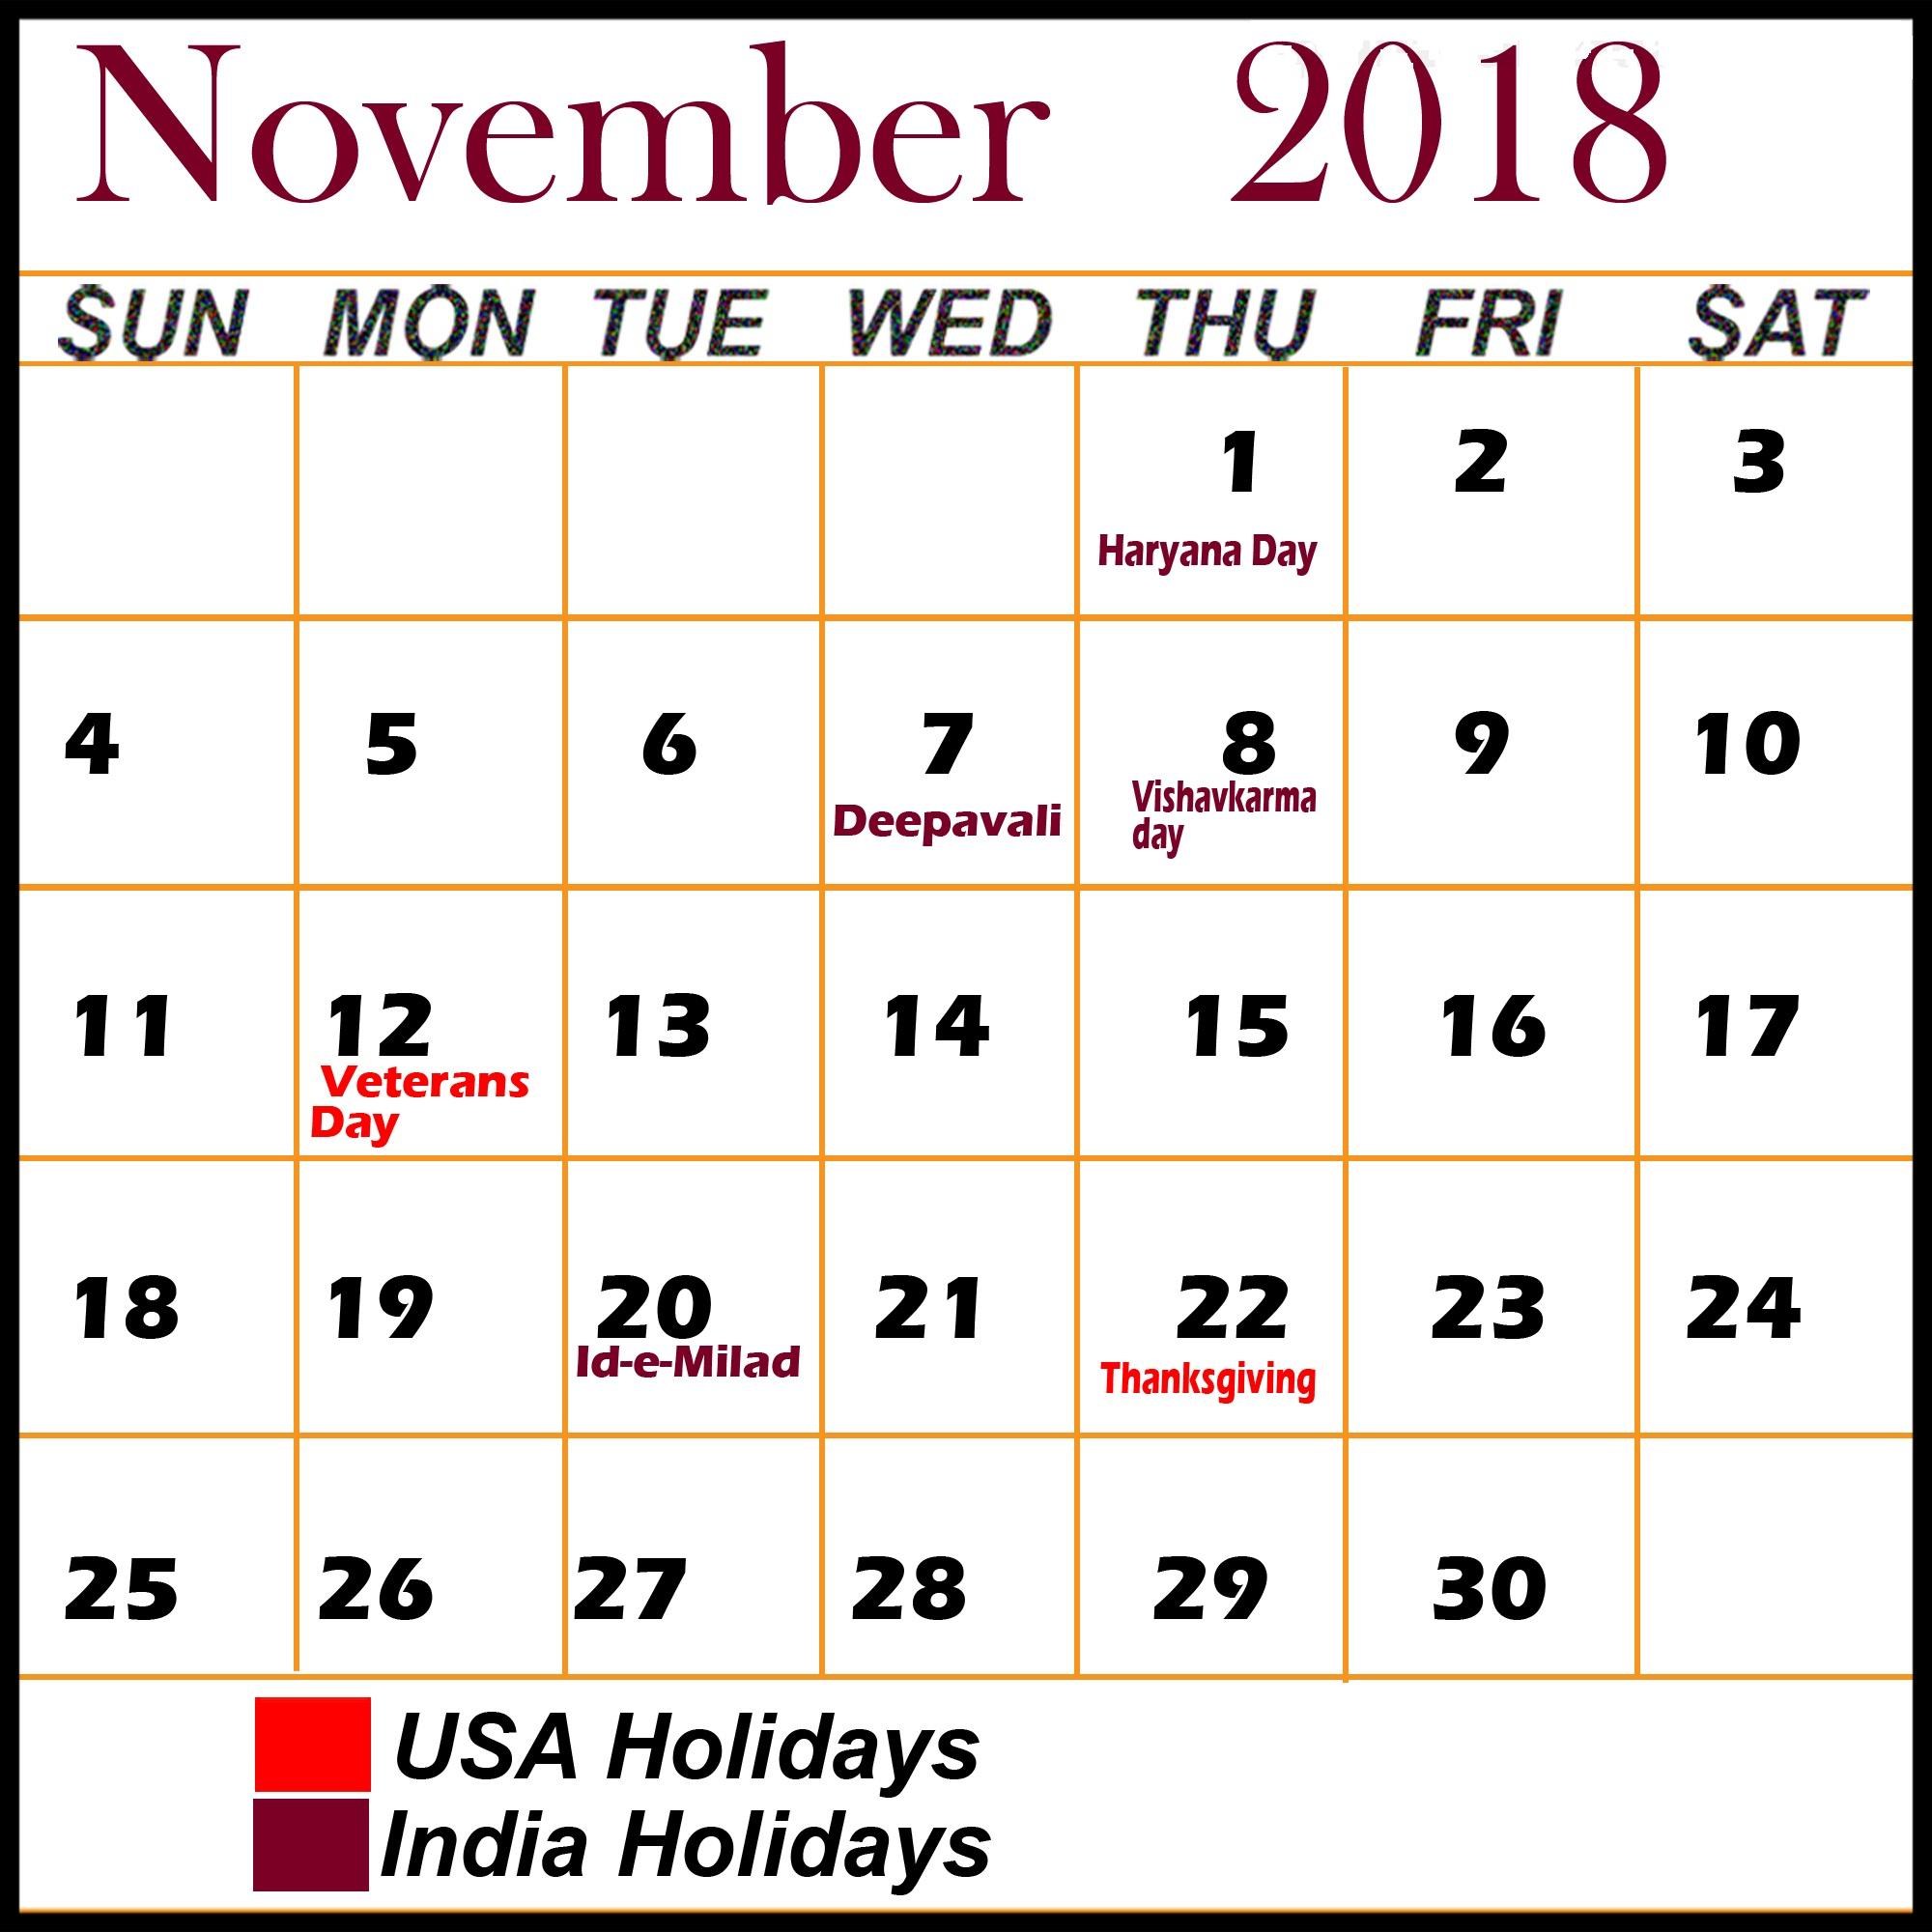 November-2018-Calendar-With-Holidays-Template - November Calendar throughout Holidays Calendar Templates November